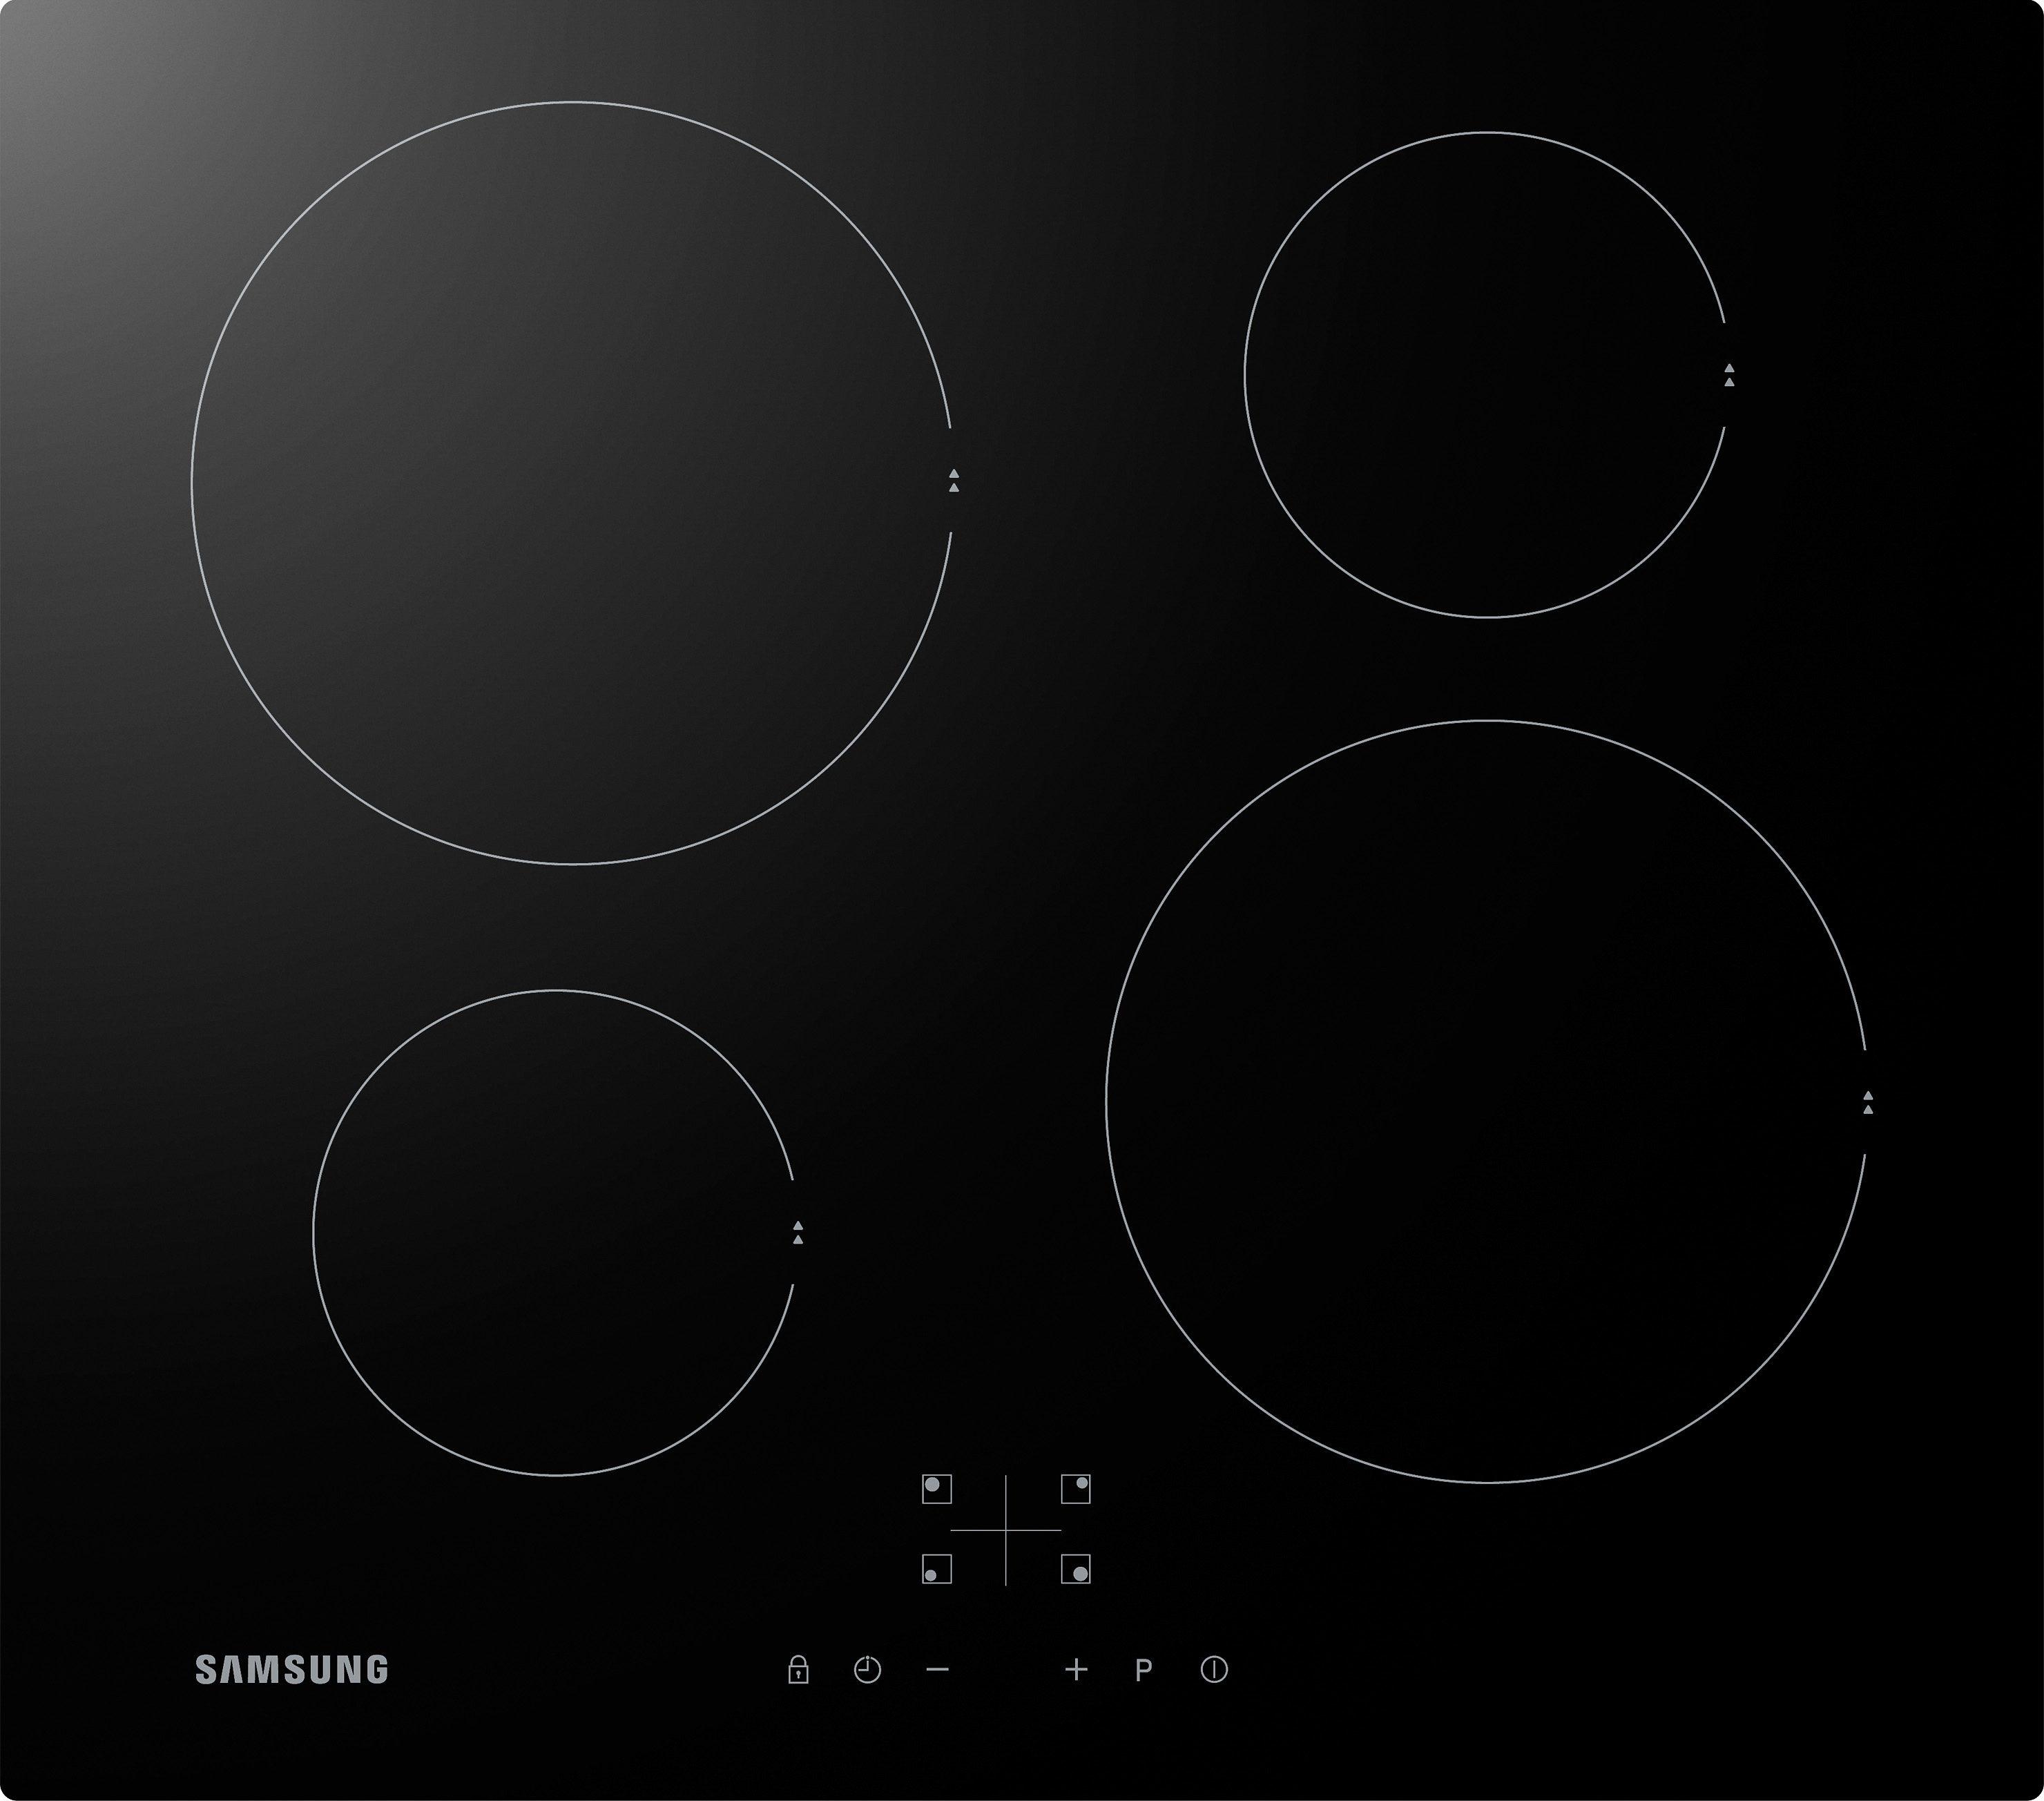 Samsung Induktions-Kochfeld, NZ64F3NM1AB/UR